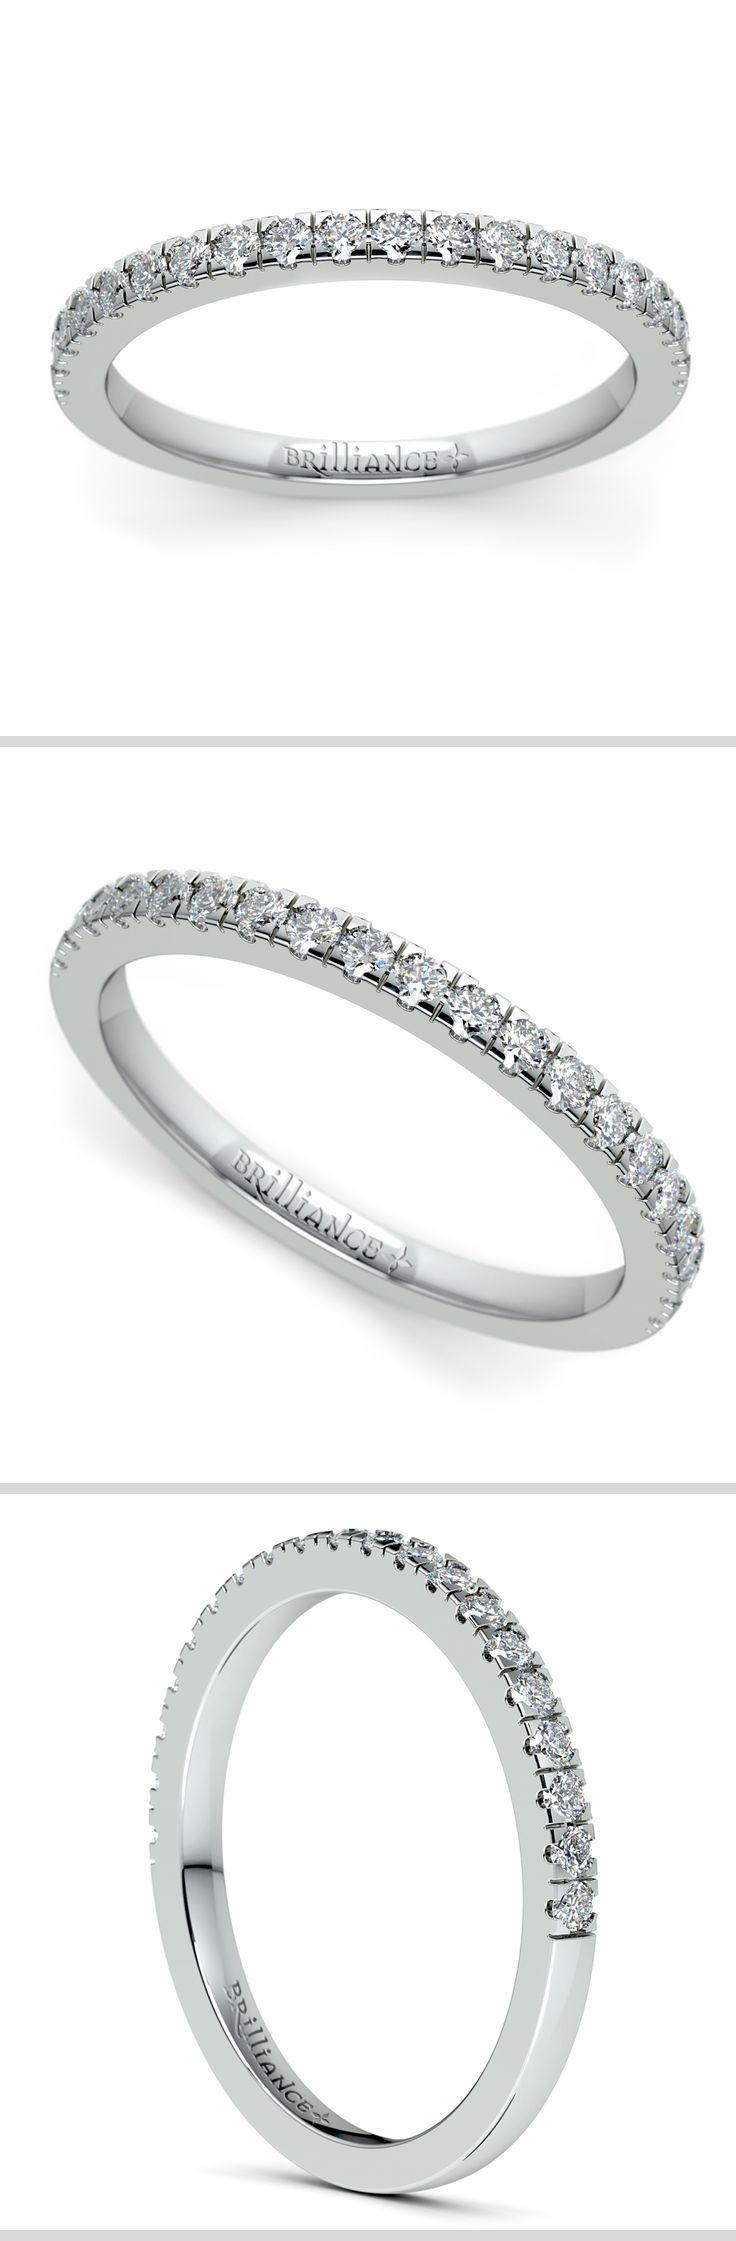 Twenty Round Cut Diamonds Are Pave Set In This Petite Pave Diamond Band In  Platinum